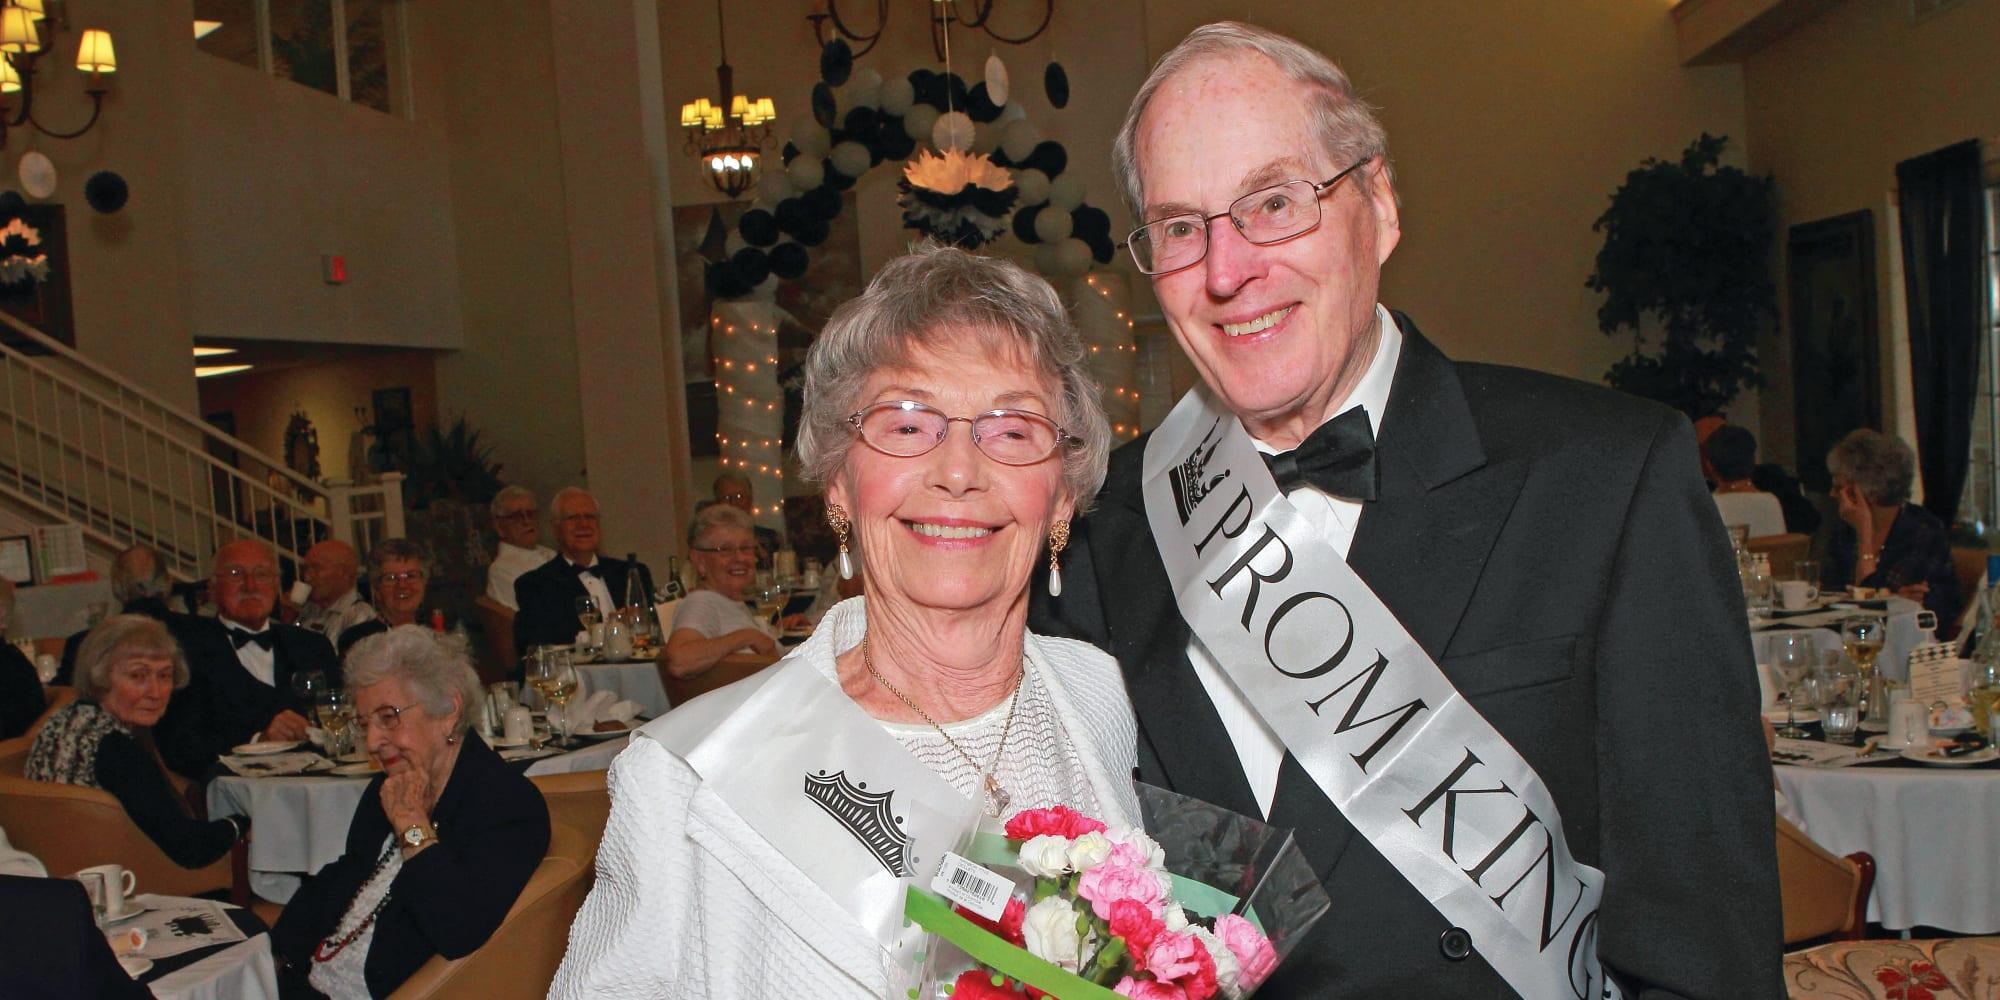 Residents enjoying prom night at Linwood Estates Gracious Retirement Living in Lawrenceville, Georgia